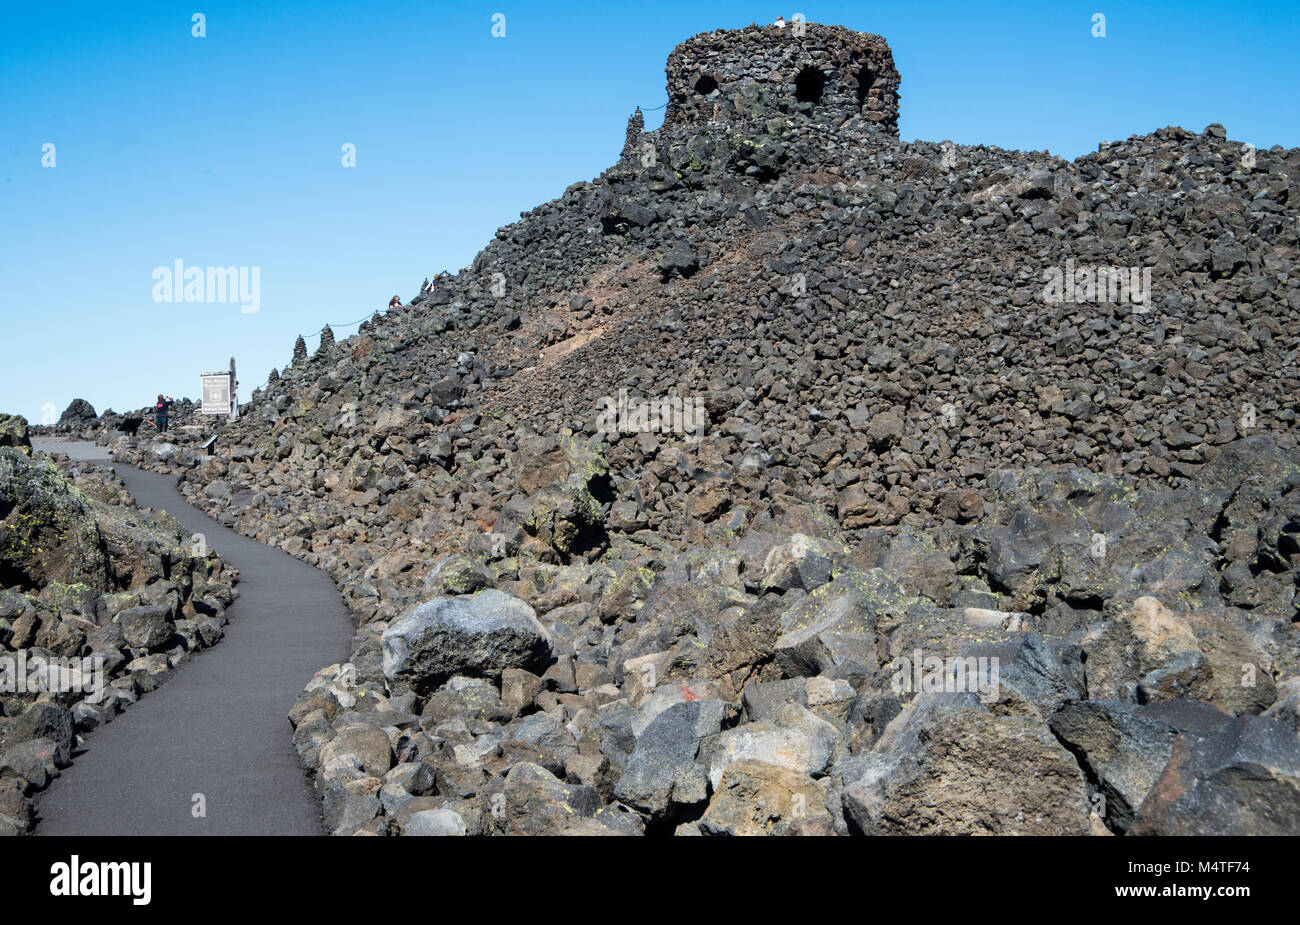 Dee Wright Memorial in lava field in Oregon - Stock Image